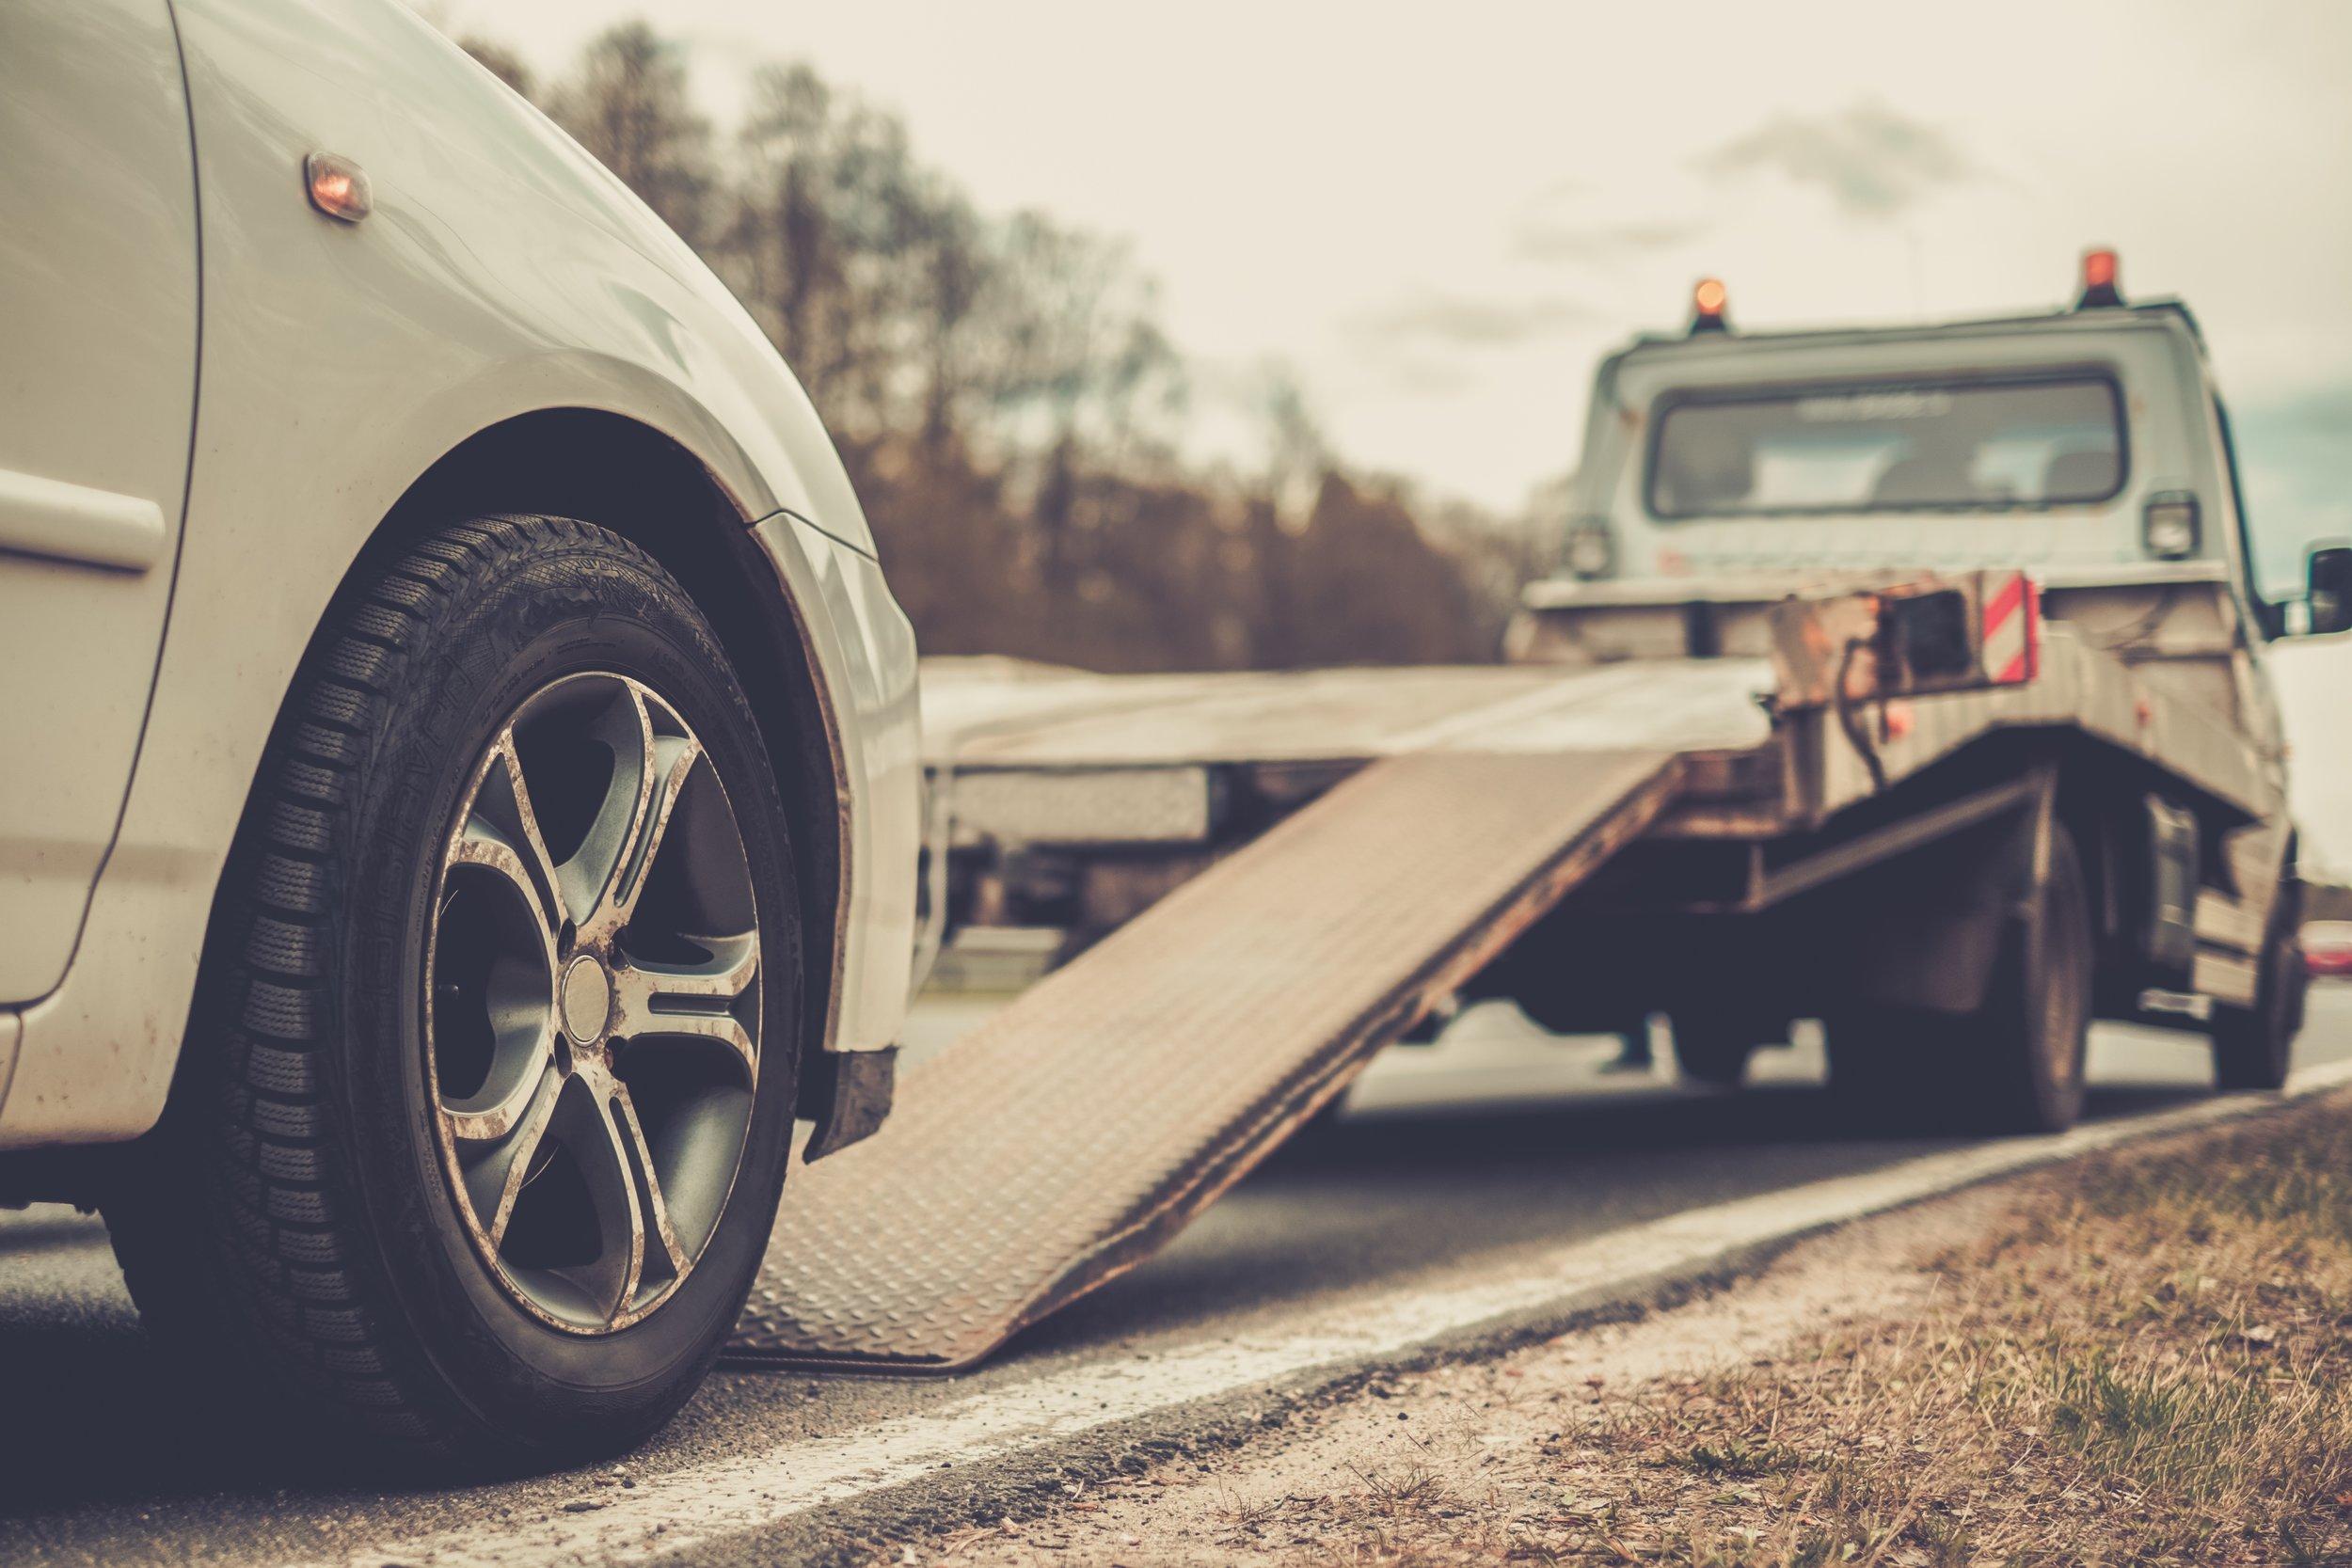 Copy of Loading broken car on a tow truck on a roadside